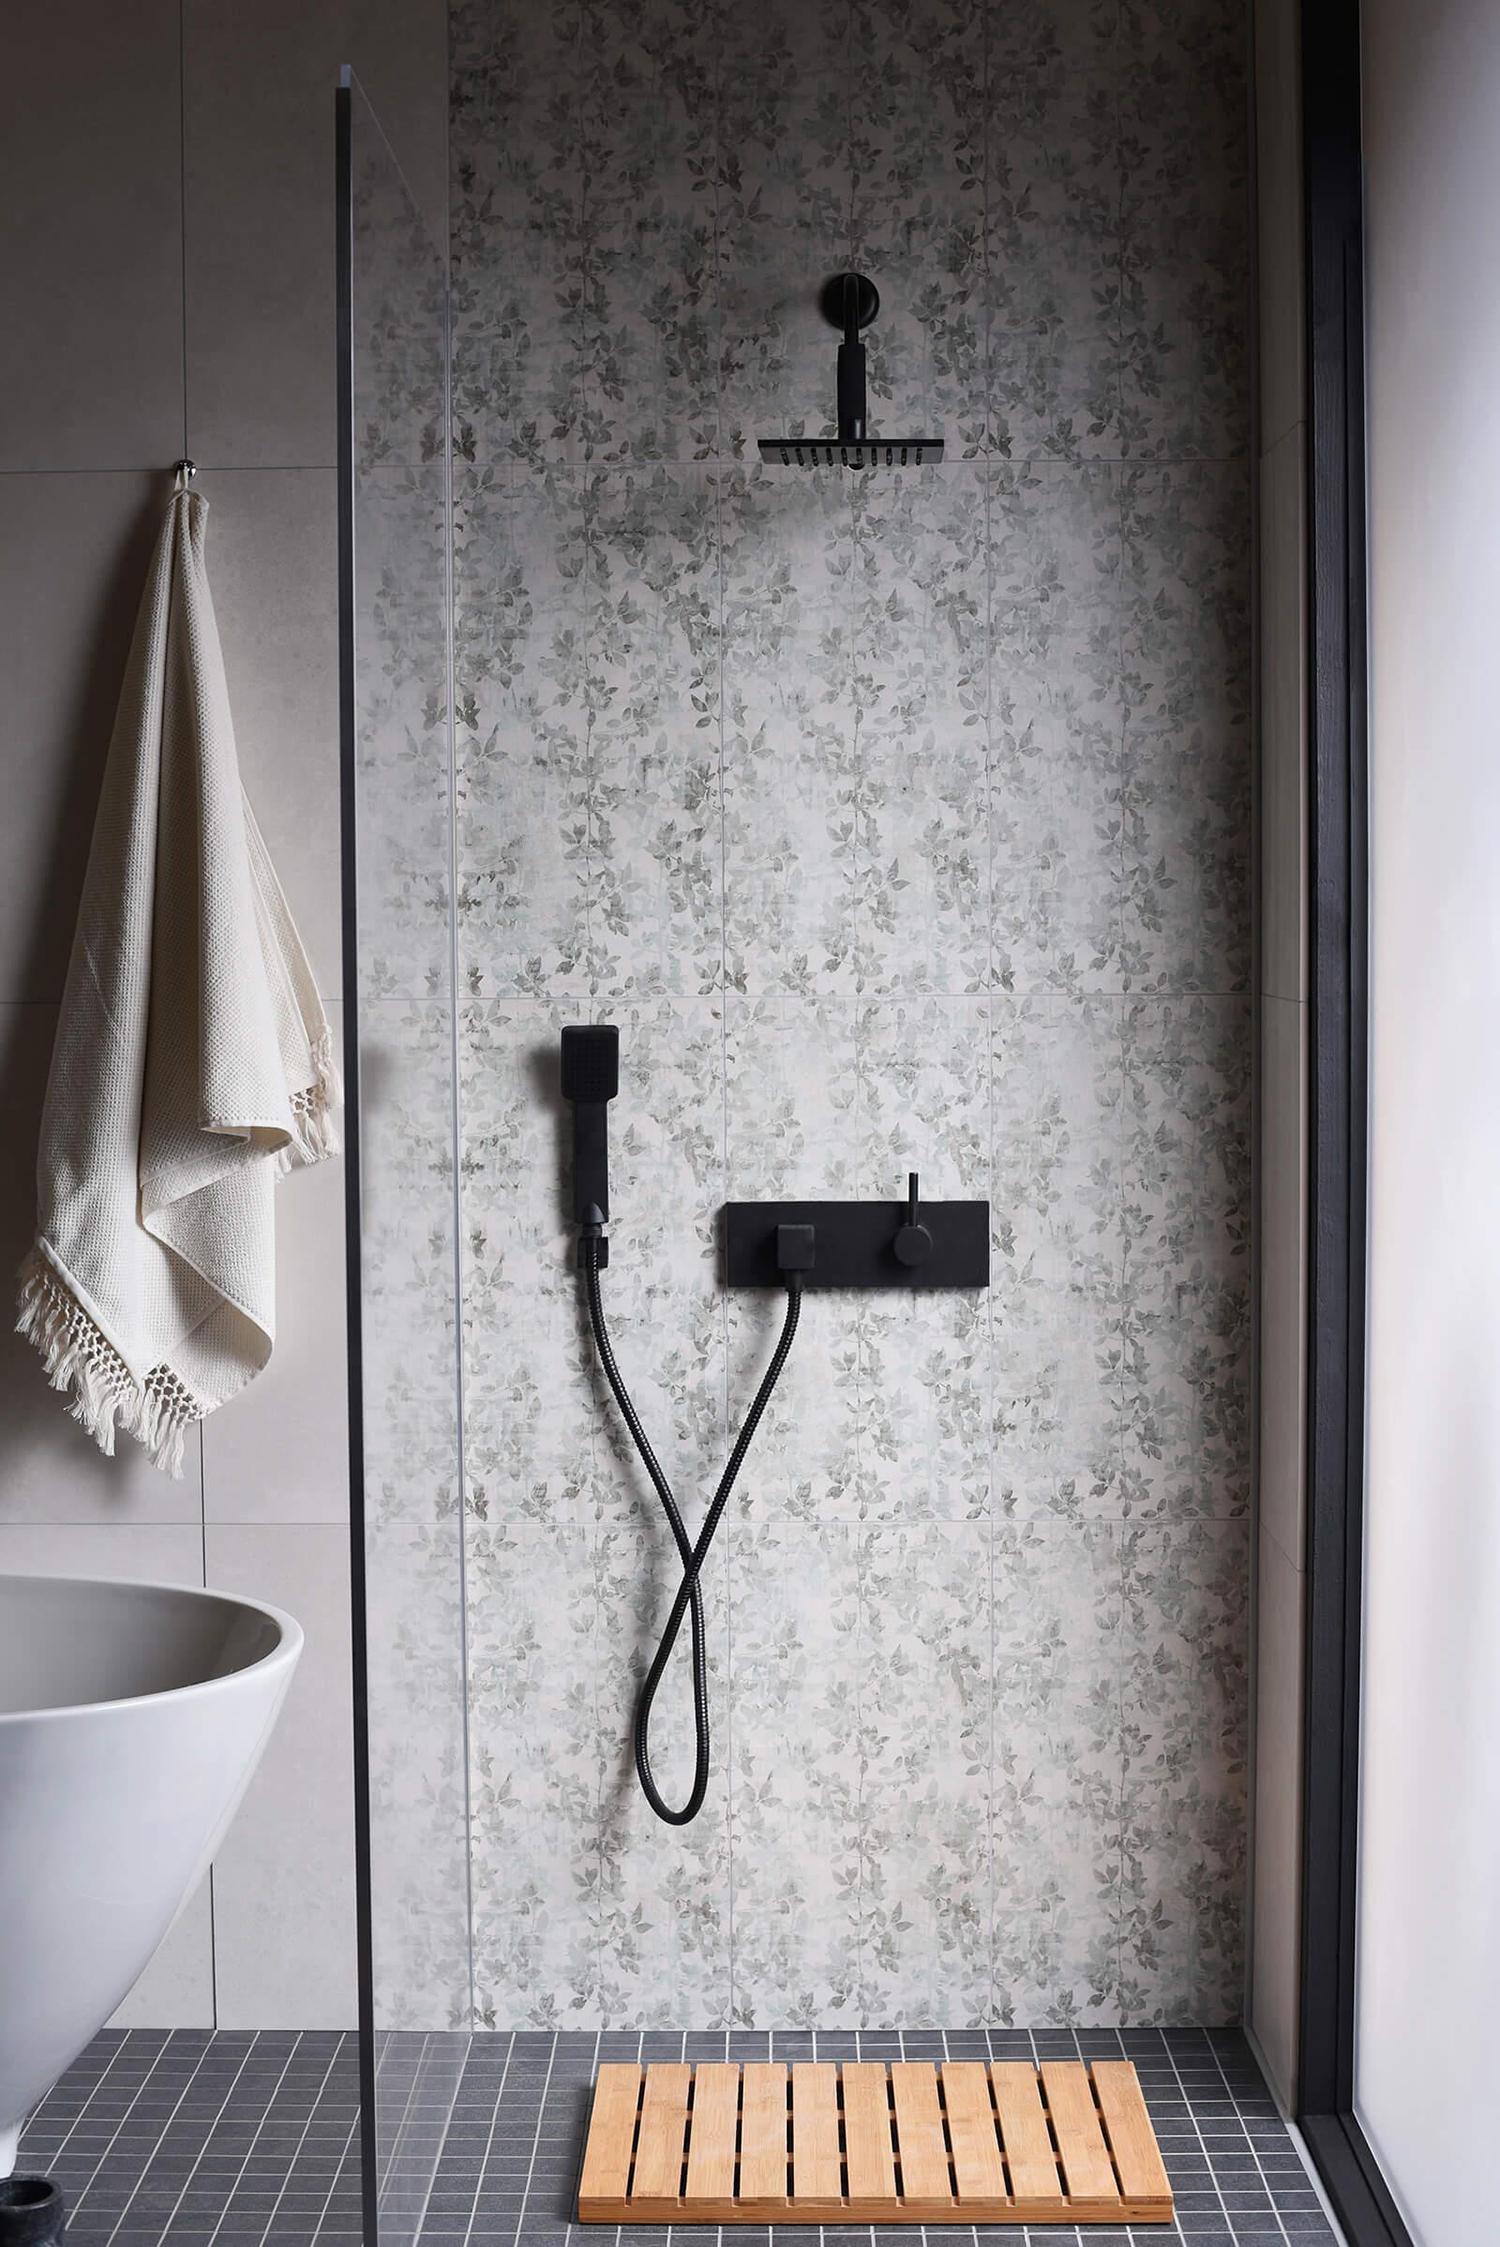 Living Pergola Ceramic Patterned Tiles